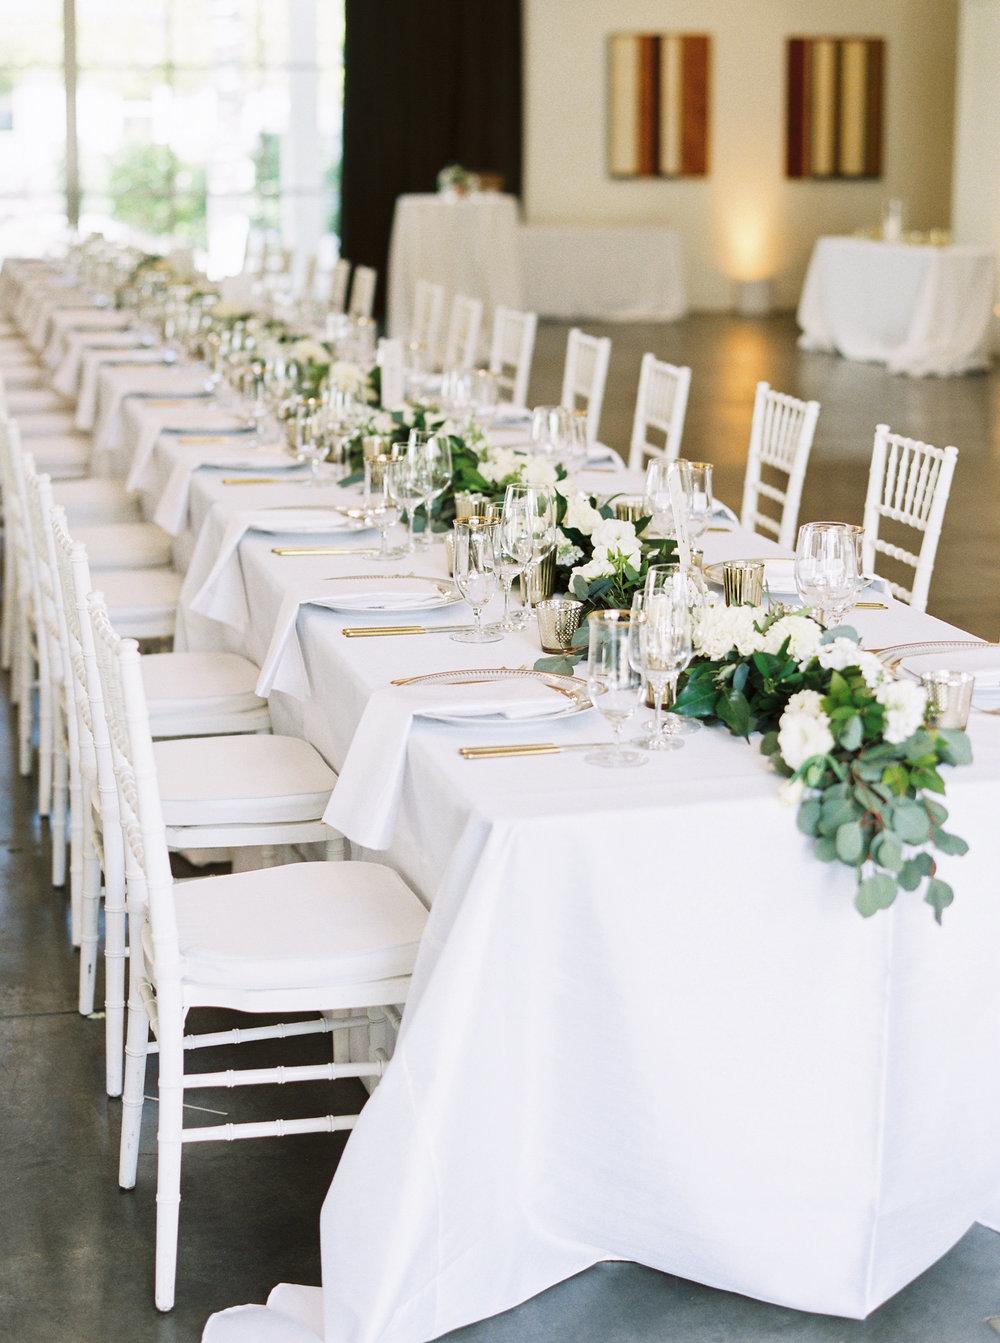 intimate-wedding-at-solage-calistoga-in-napa-152.jpg